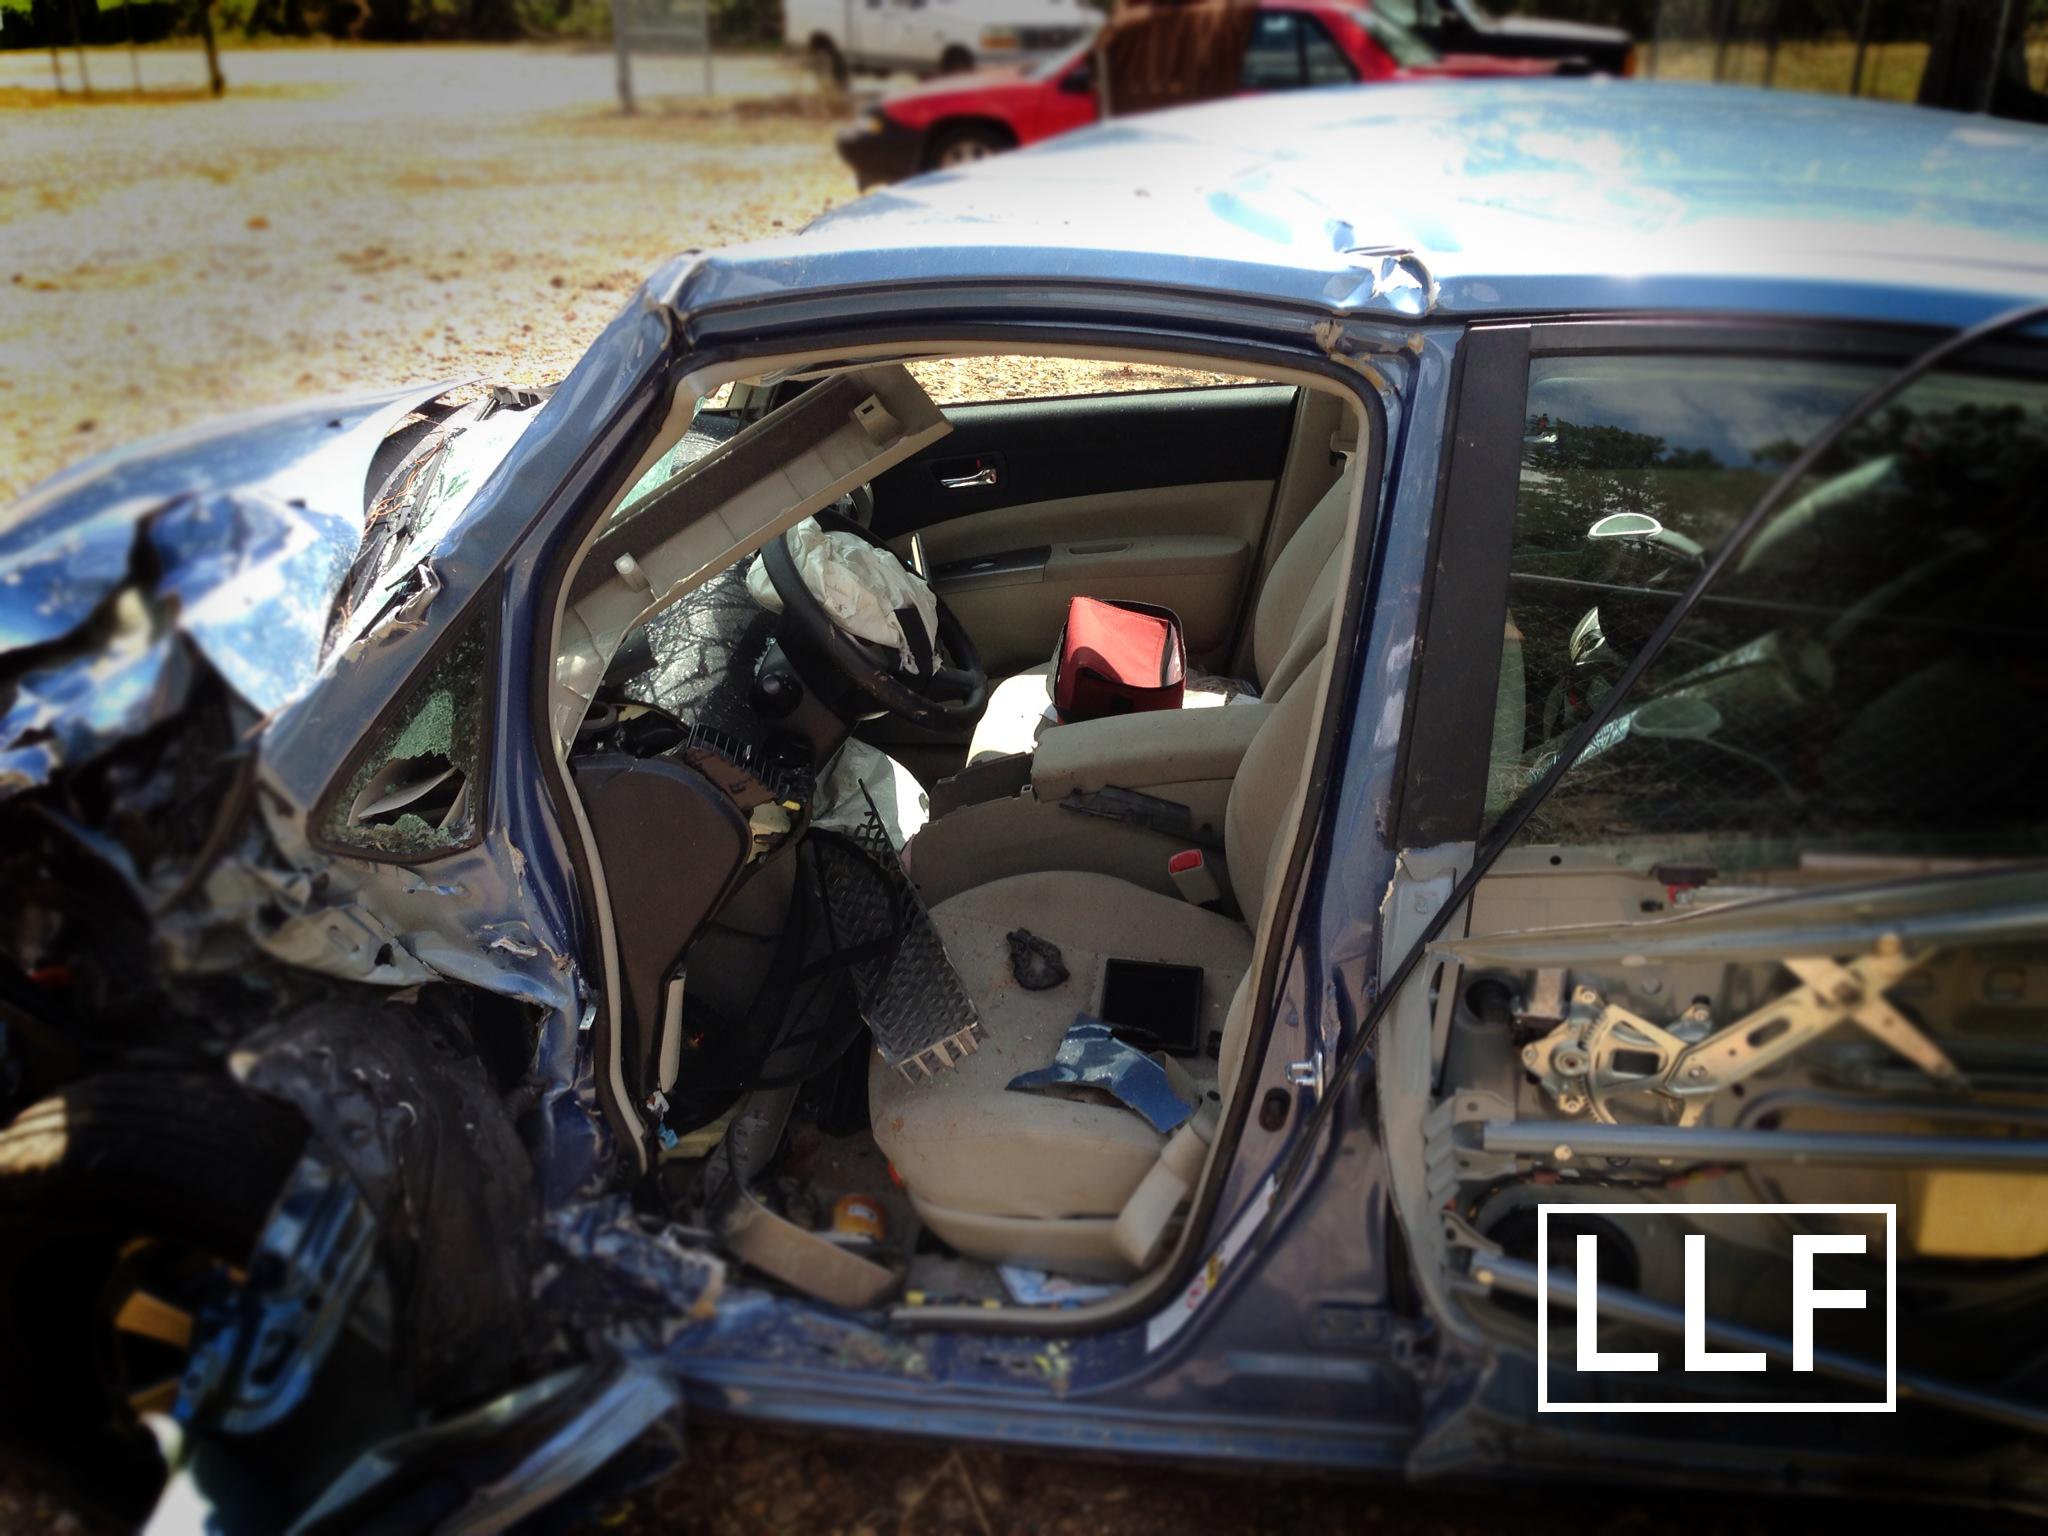 $200,000 Settlement in Serious Car Crash Case